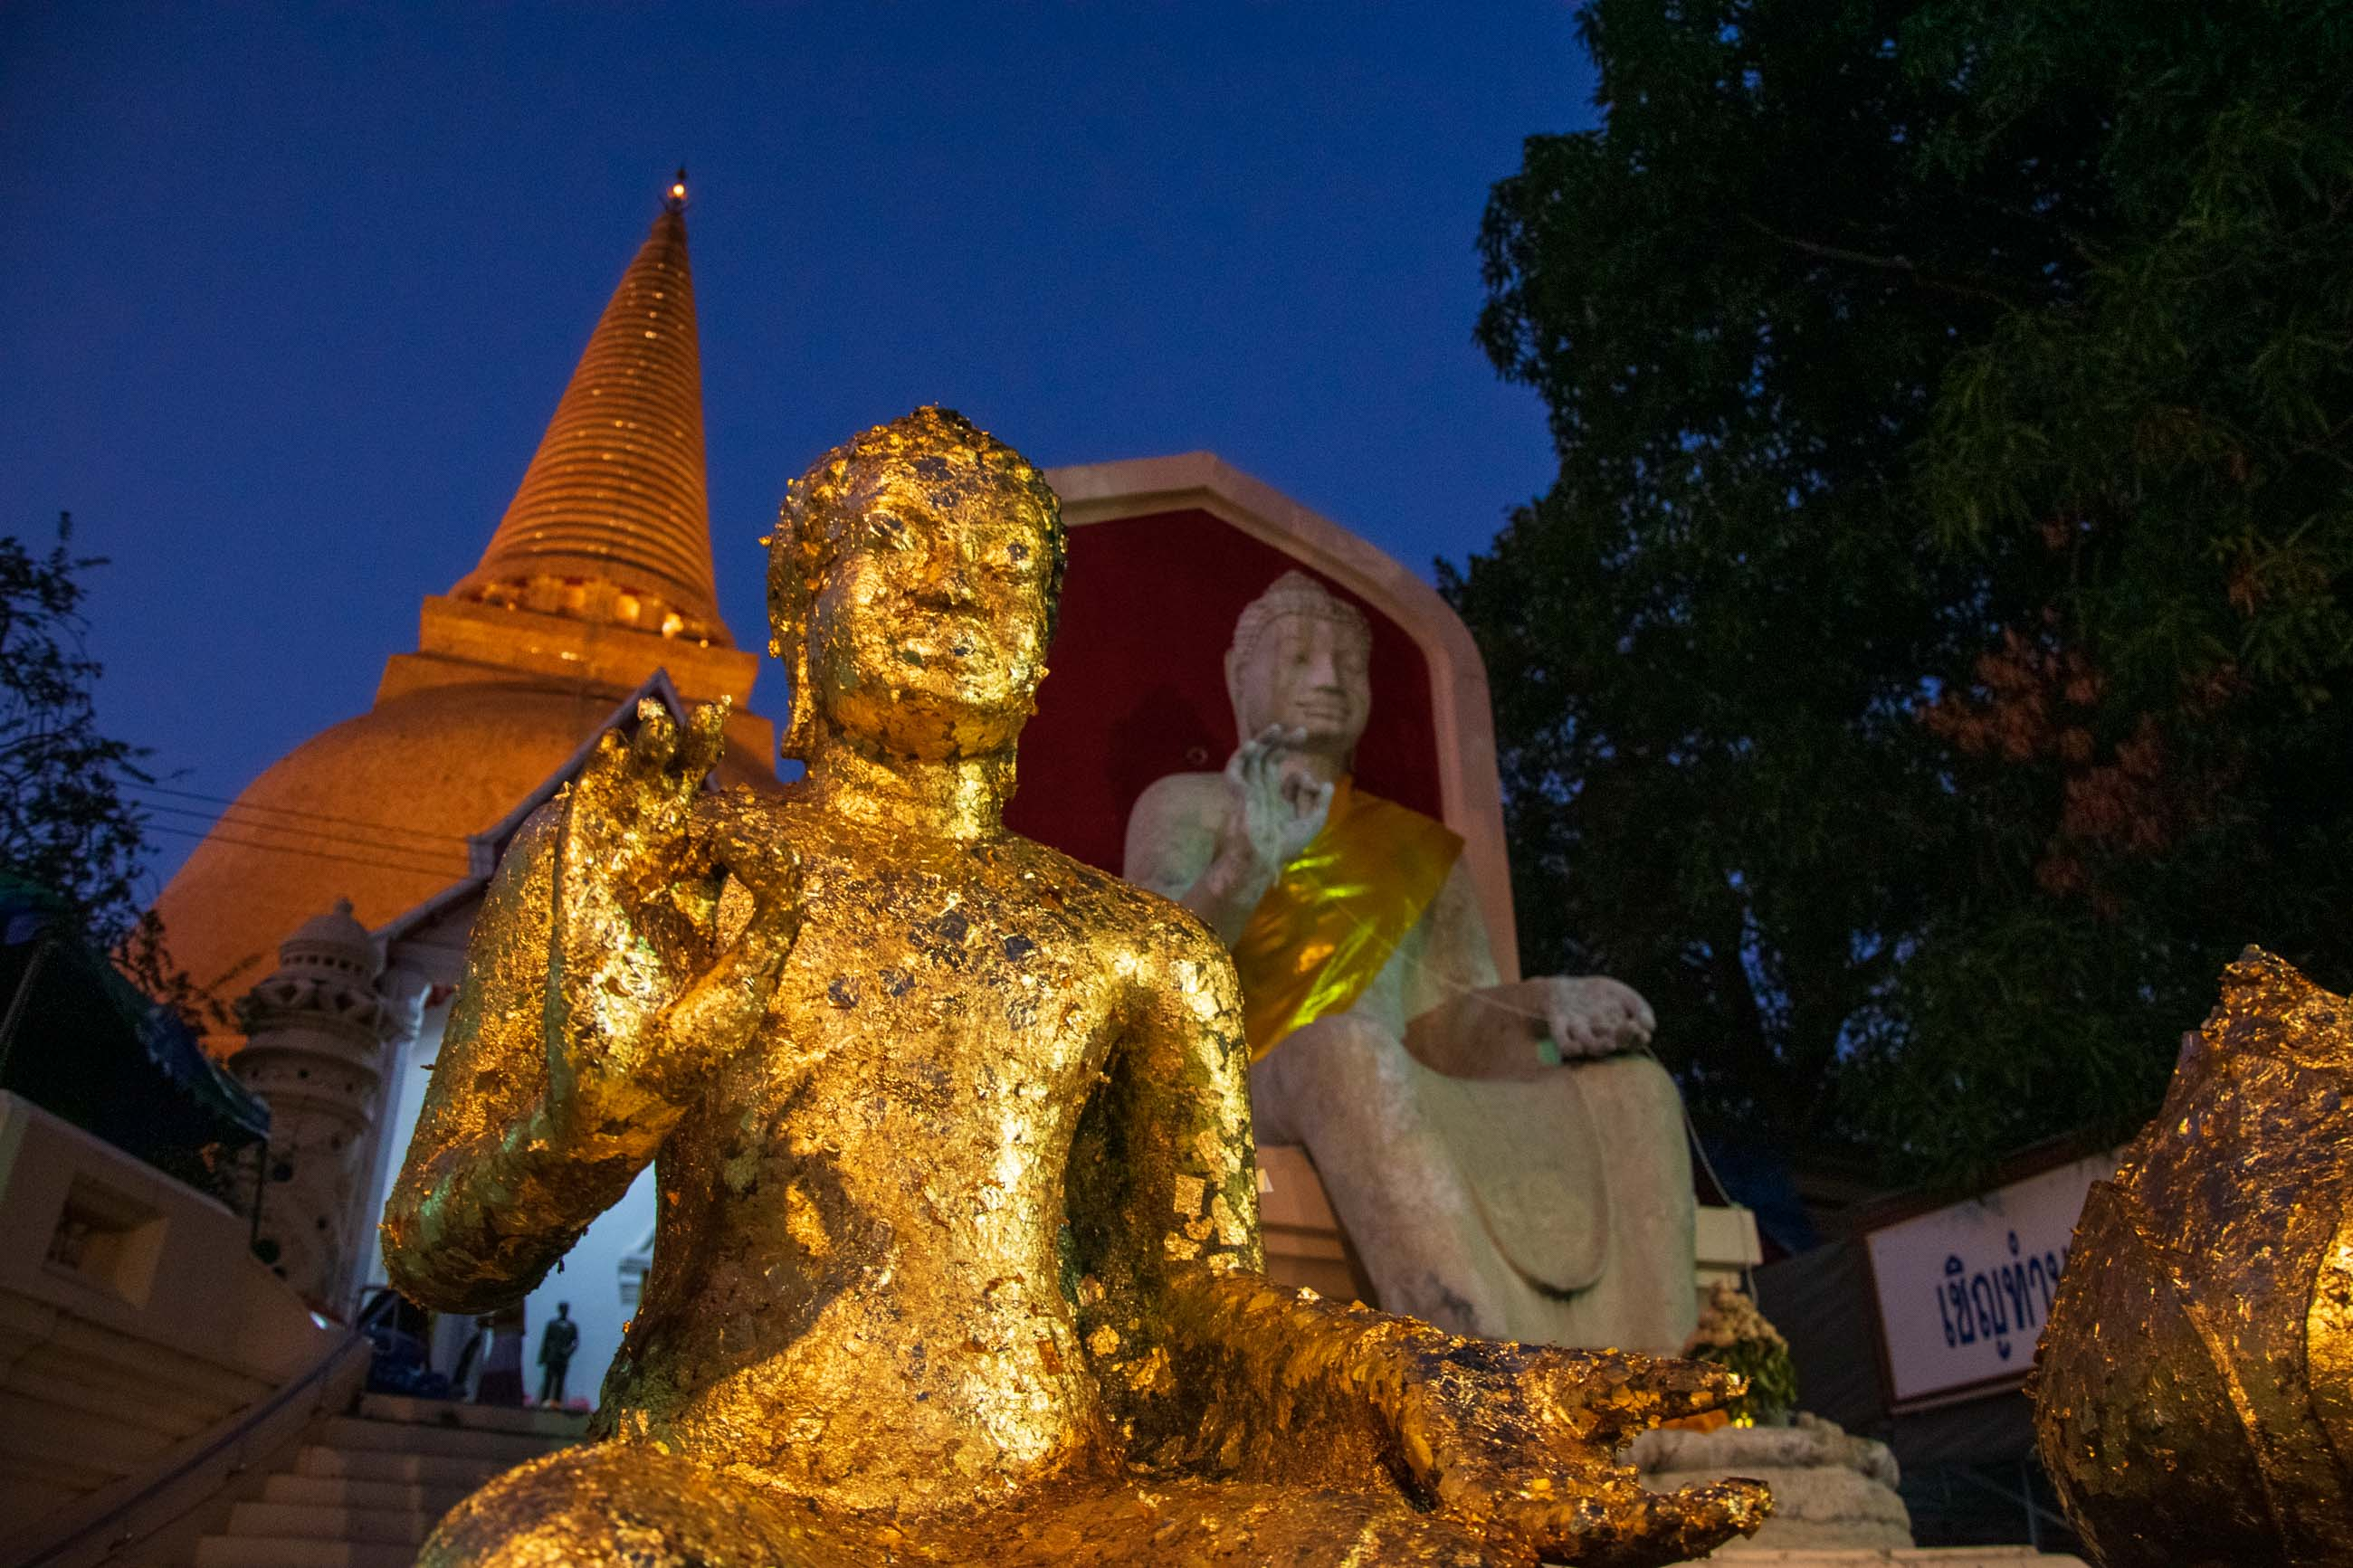 https://bubo.sk/uploads/galleries/5062/adam_zahorsky_thajsko_bangkok_dsc_0070.jpg